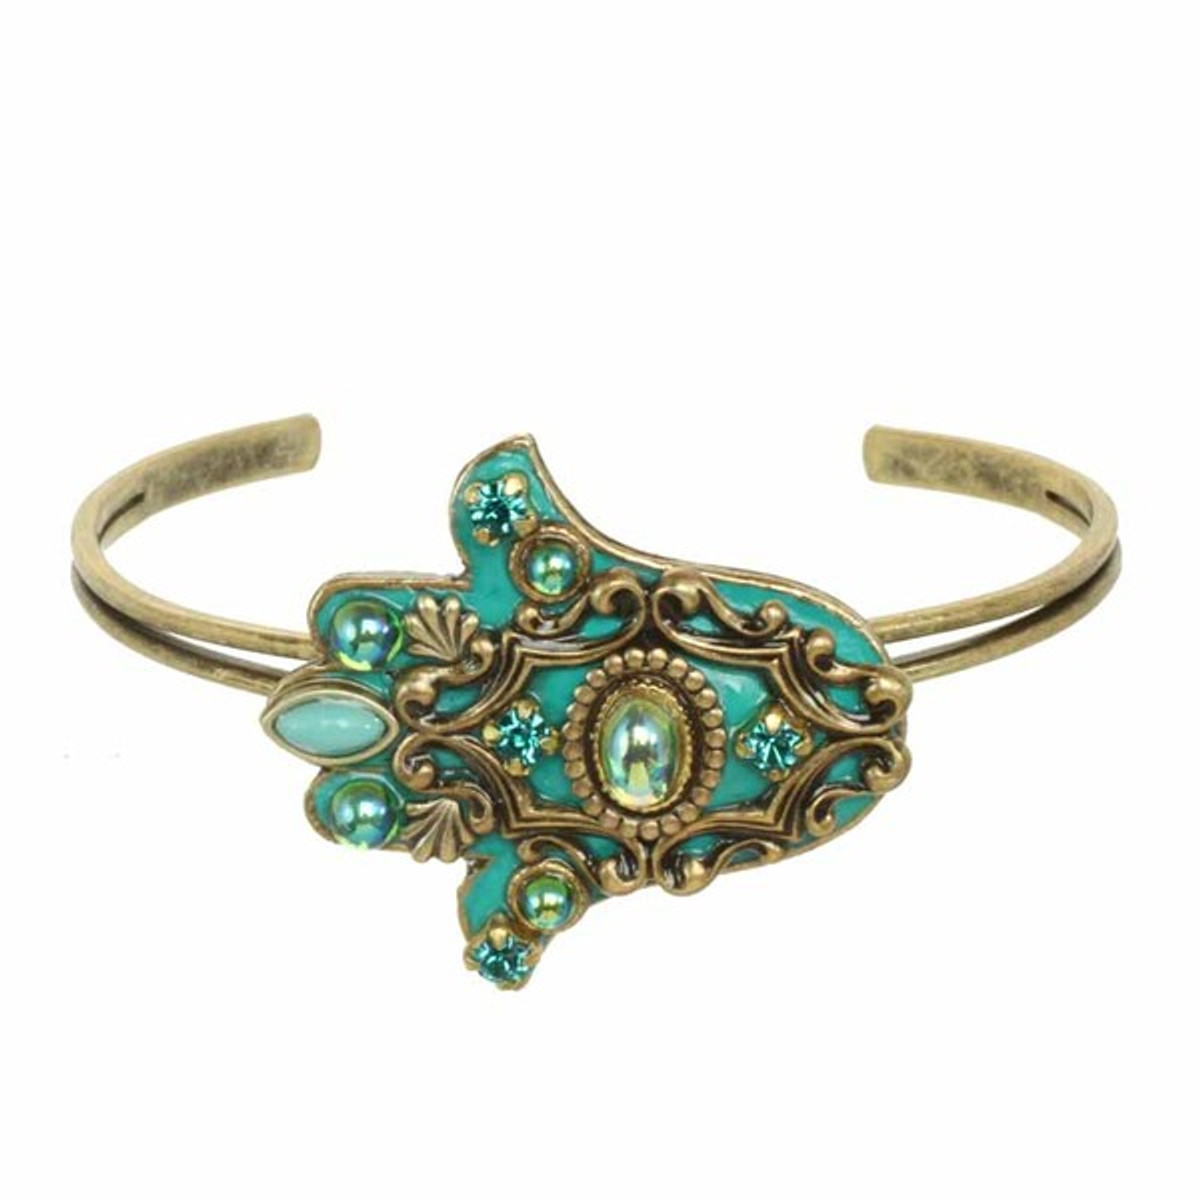 Hamsa bracelet from Michal Golan Jewelry